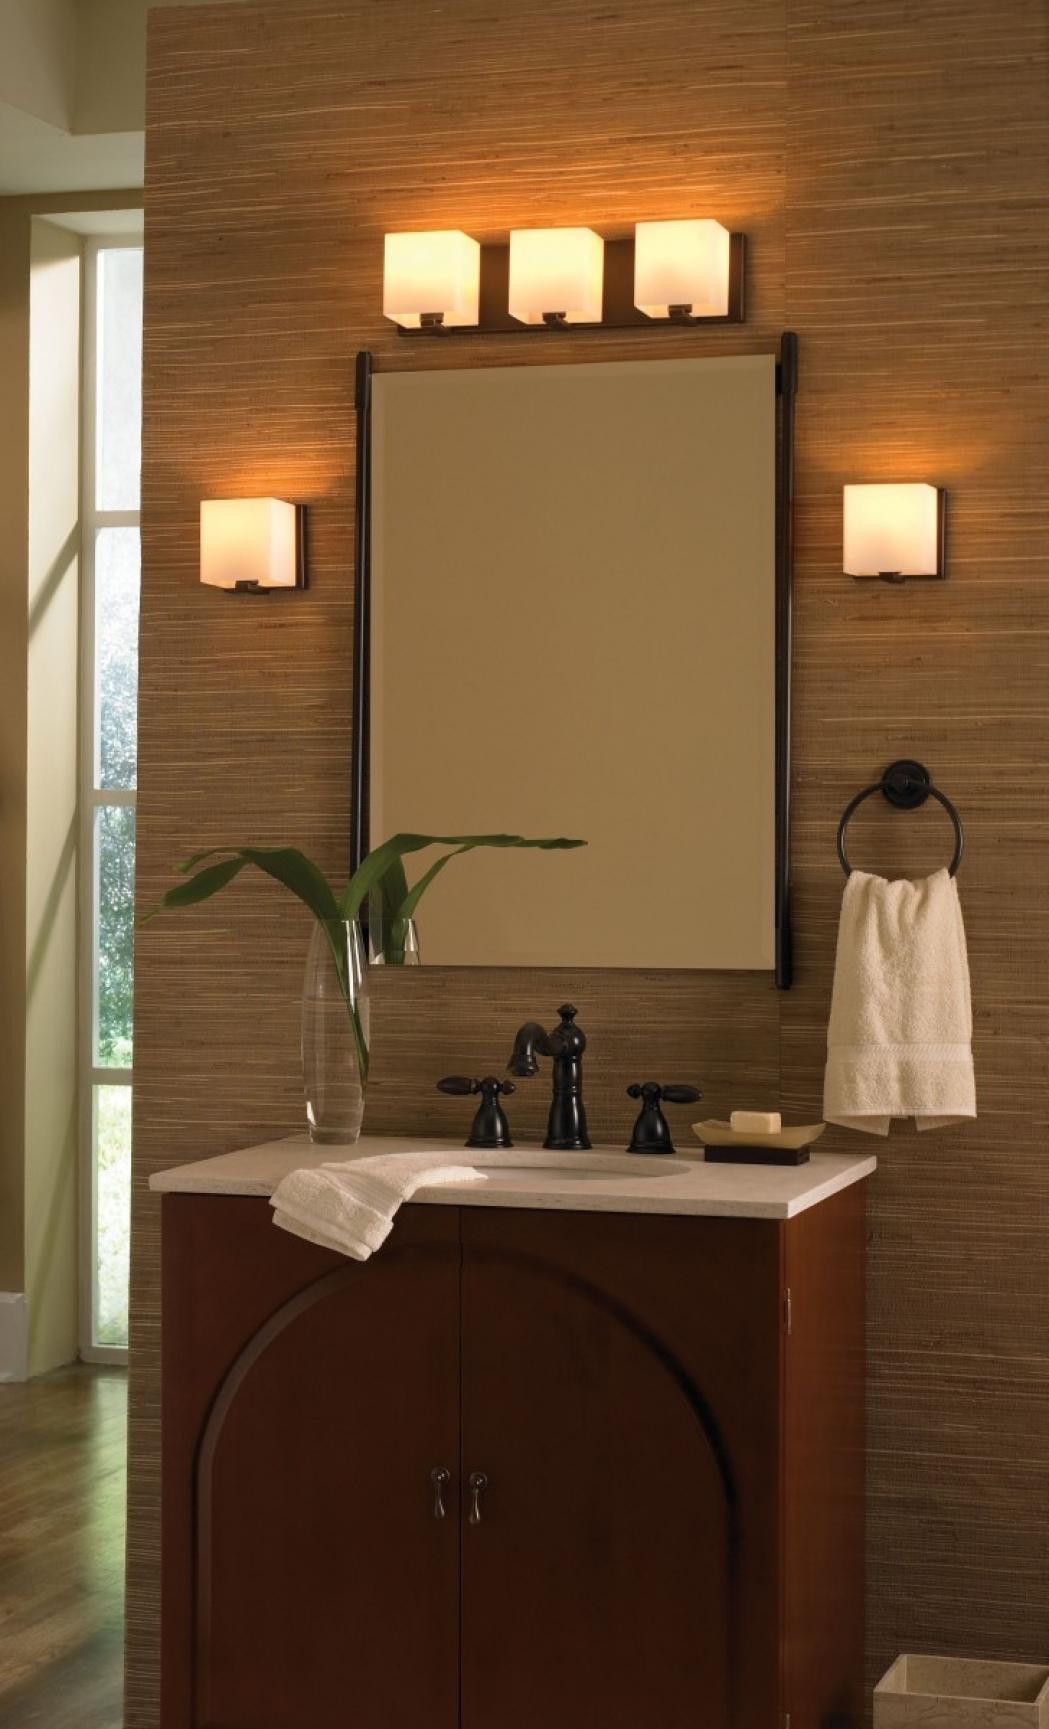 lighting for small bathrooms wall mount sliding door hardware small kitchen design with island - Homez.biz